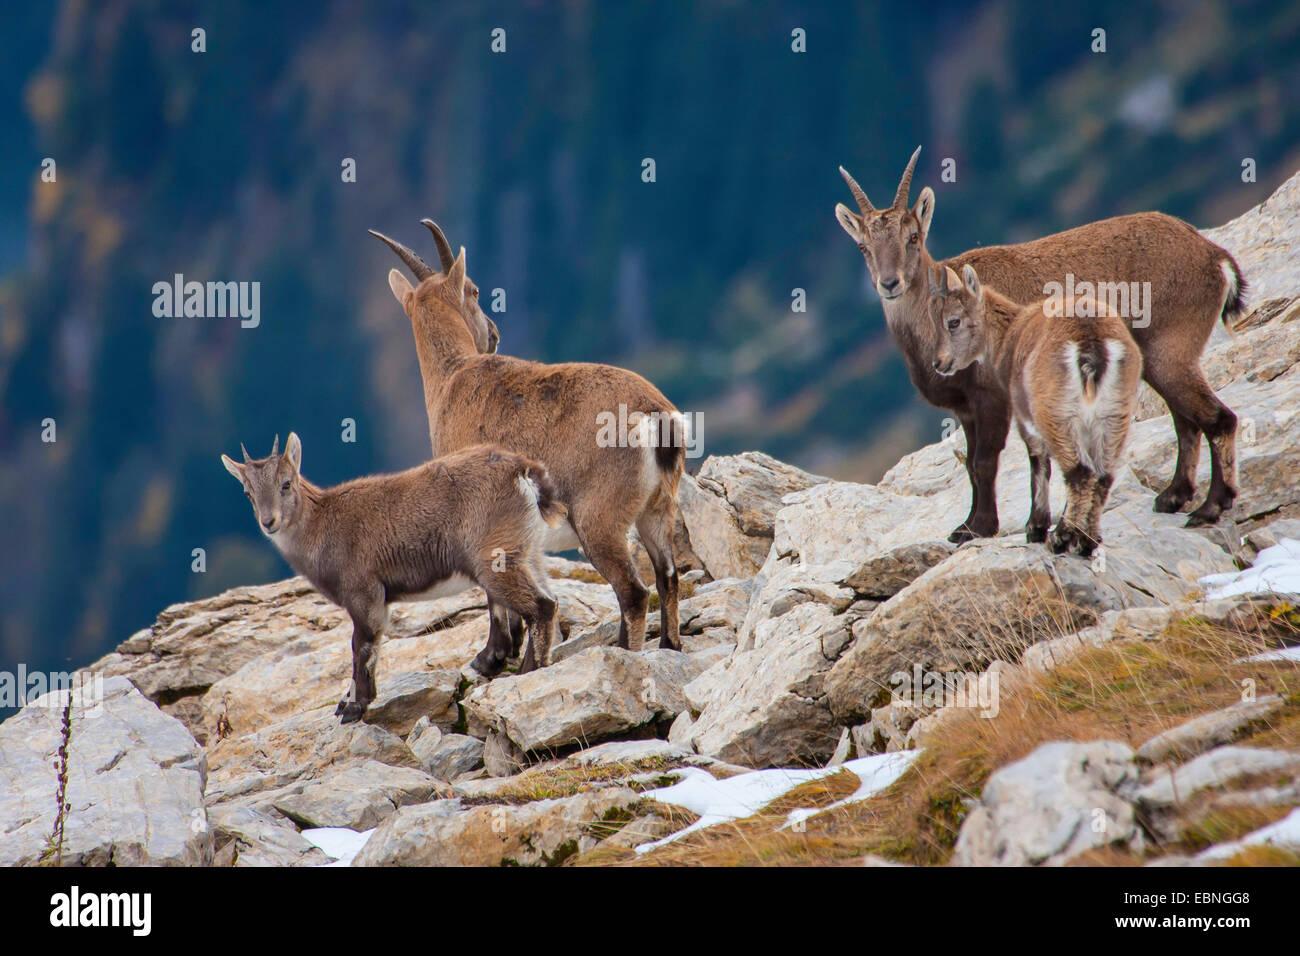 Alpine ibex (Capra ibex, Capra ibex ibex), females with their young animals in autumn, Switzerland, Toggenburg, - Stock Image